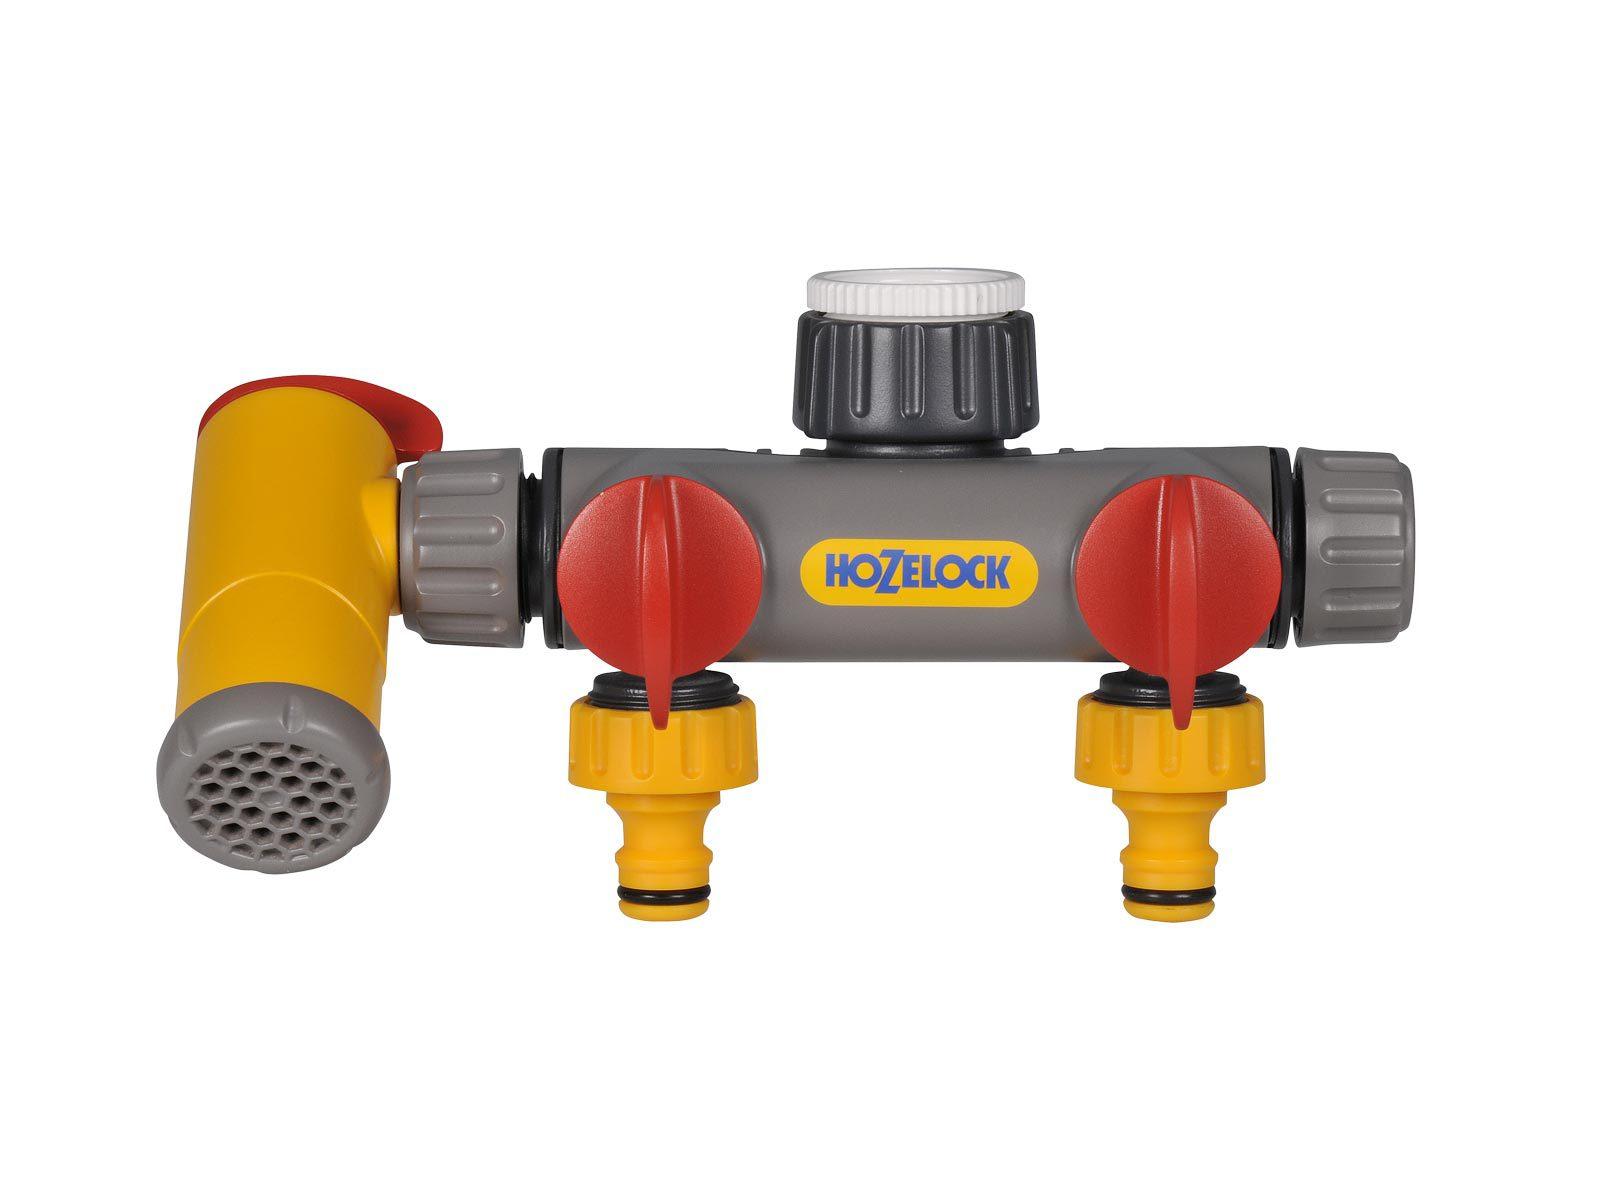 H 2250 3-Way Tap Connector